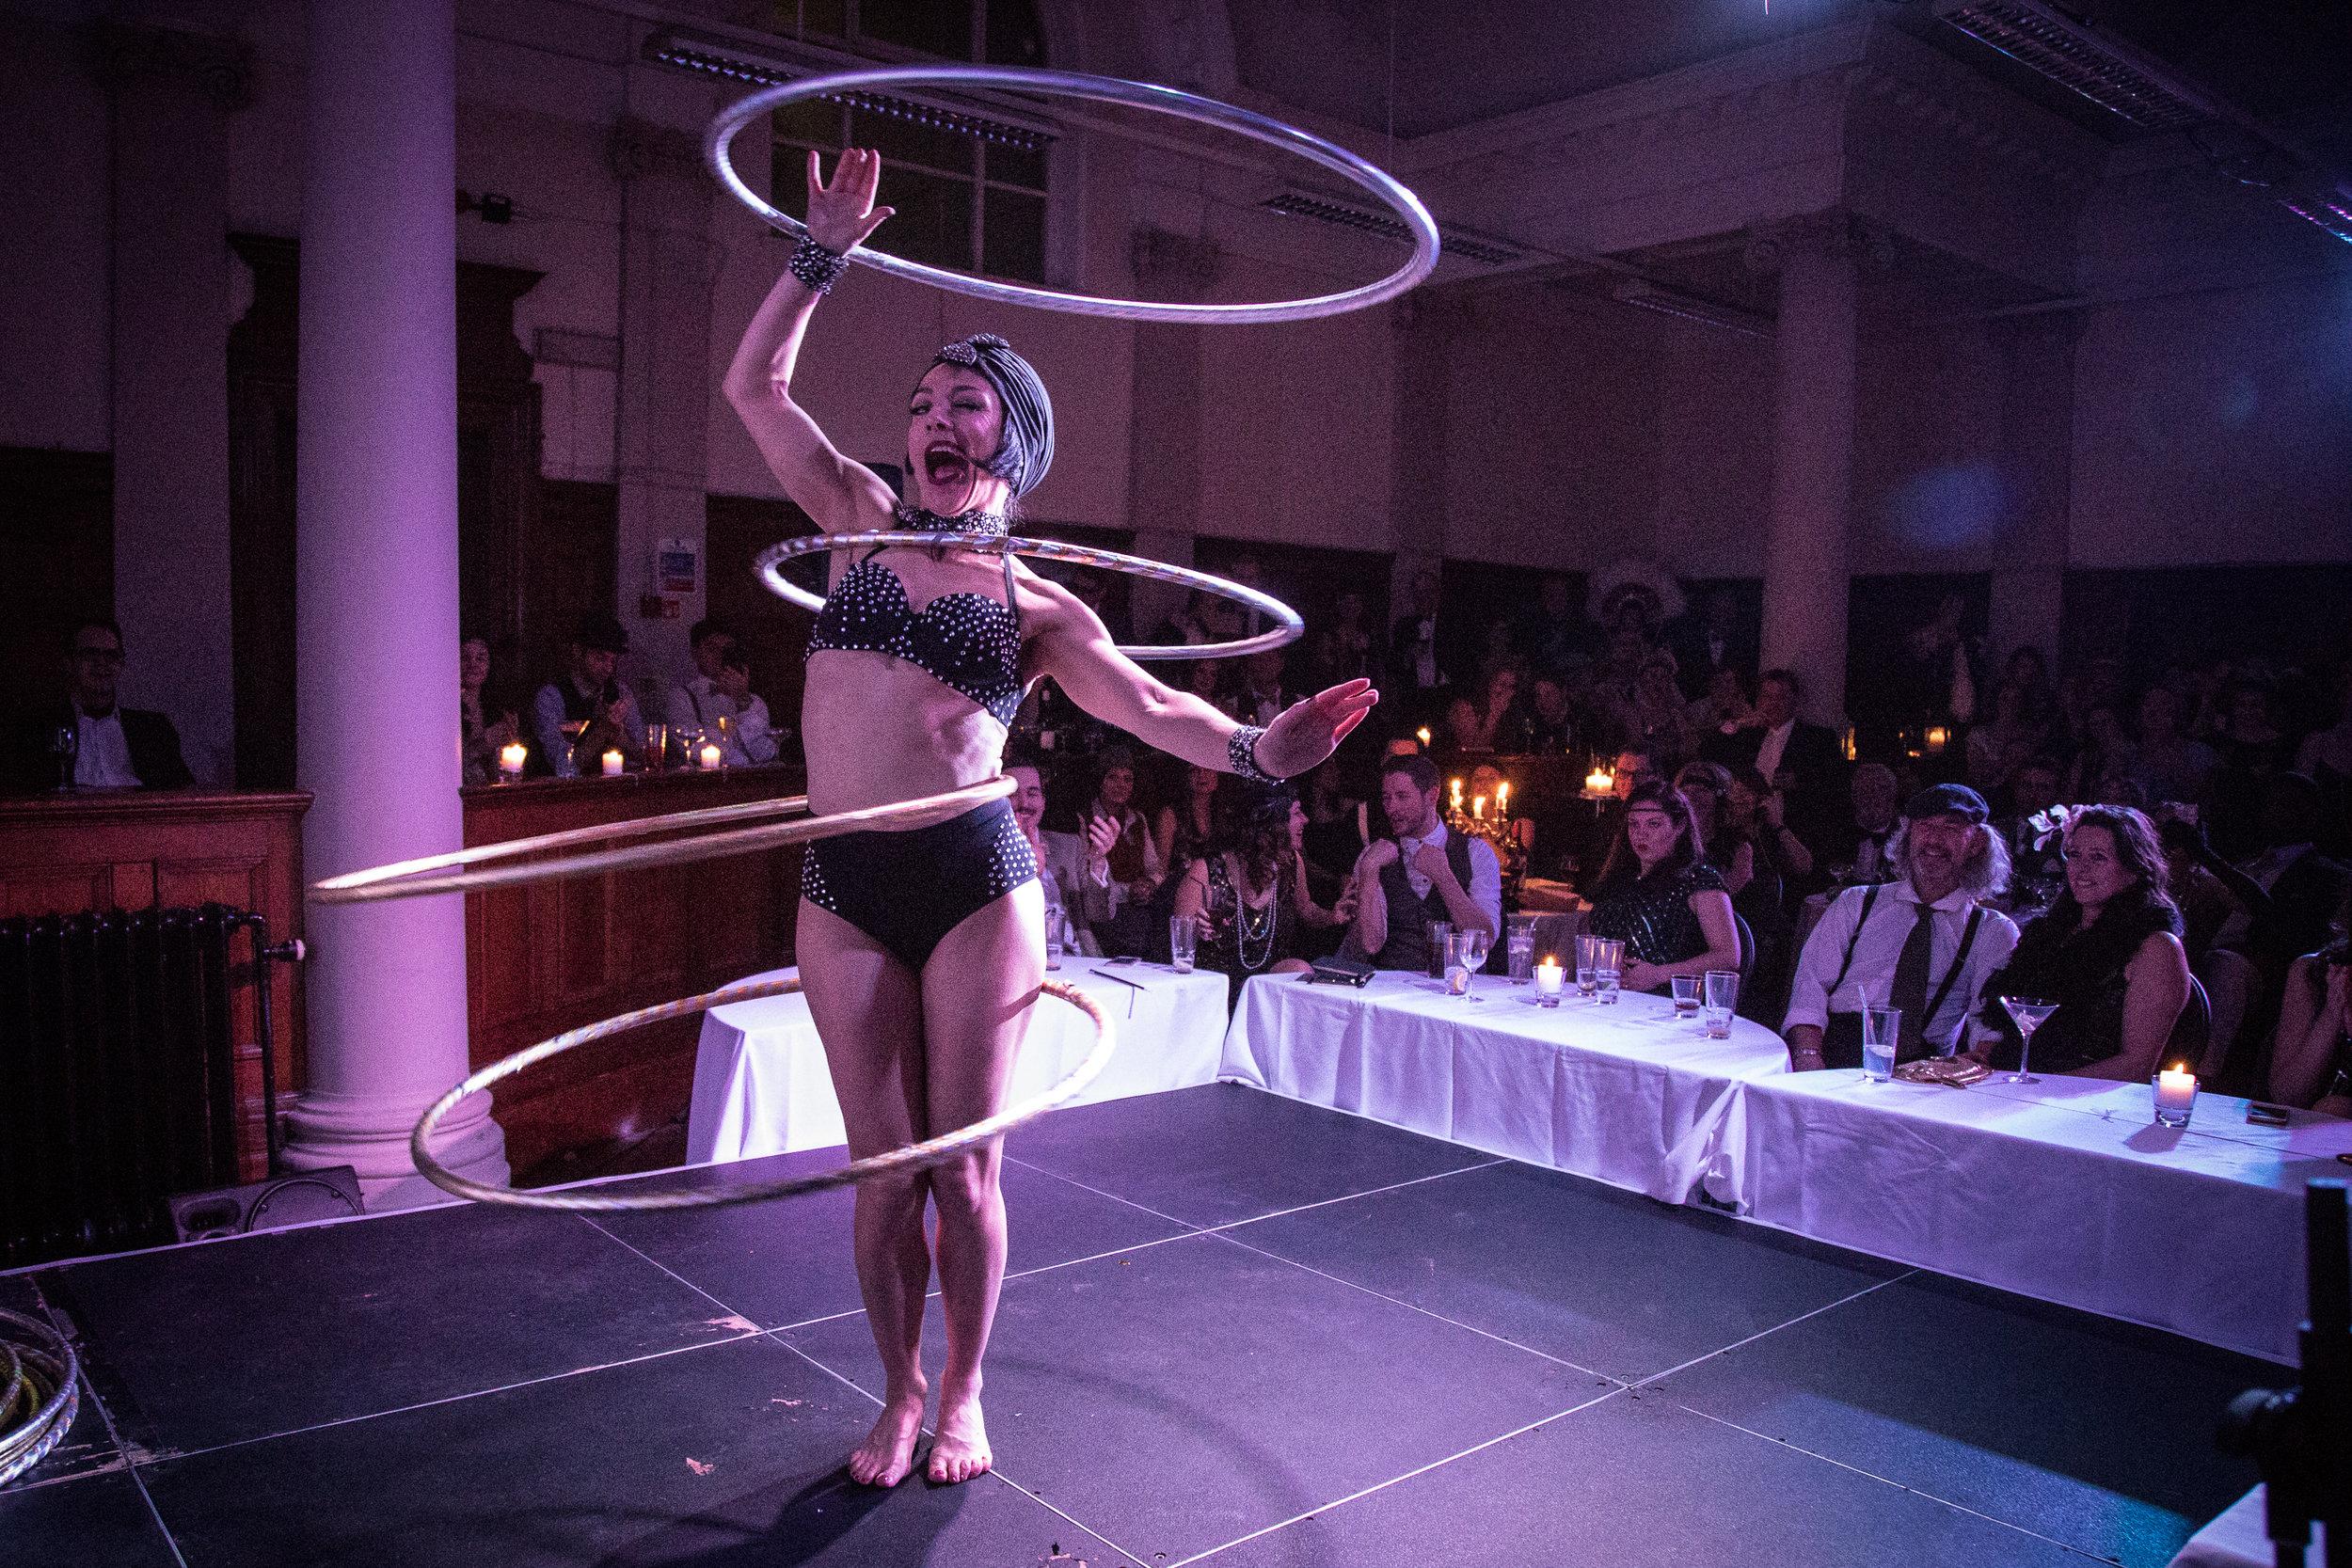 Abigail Collins hula hooping